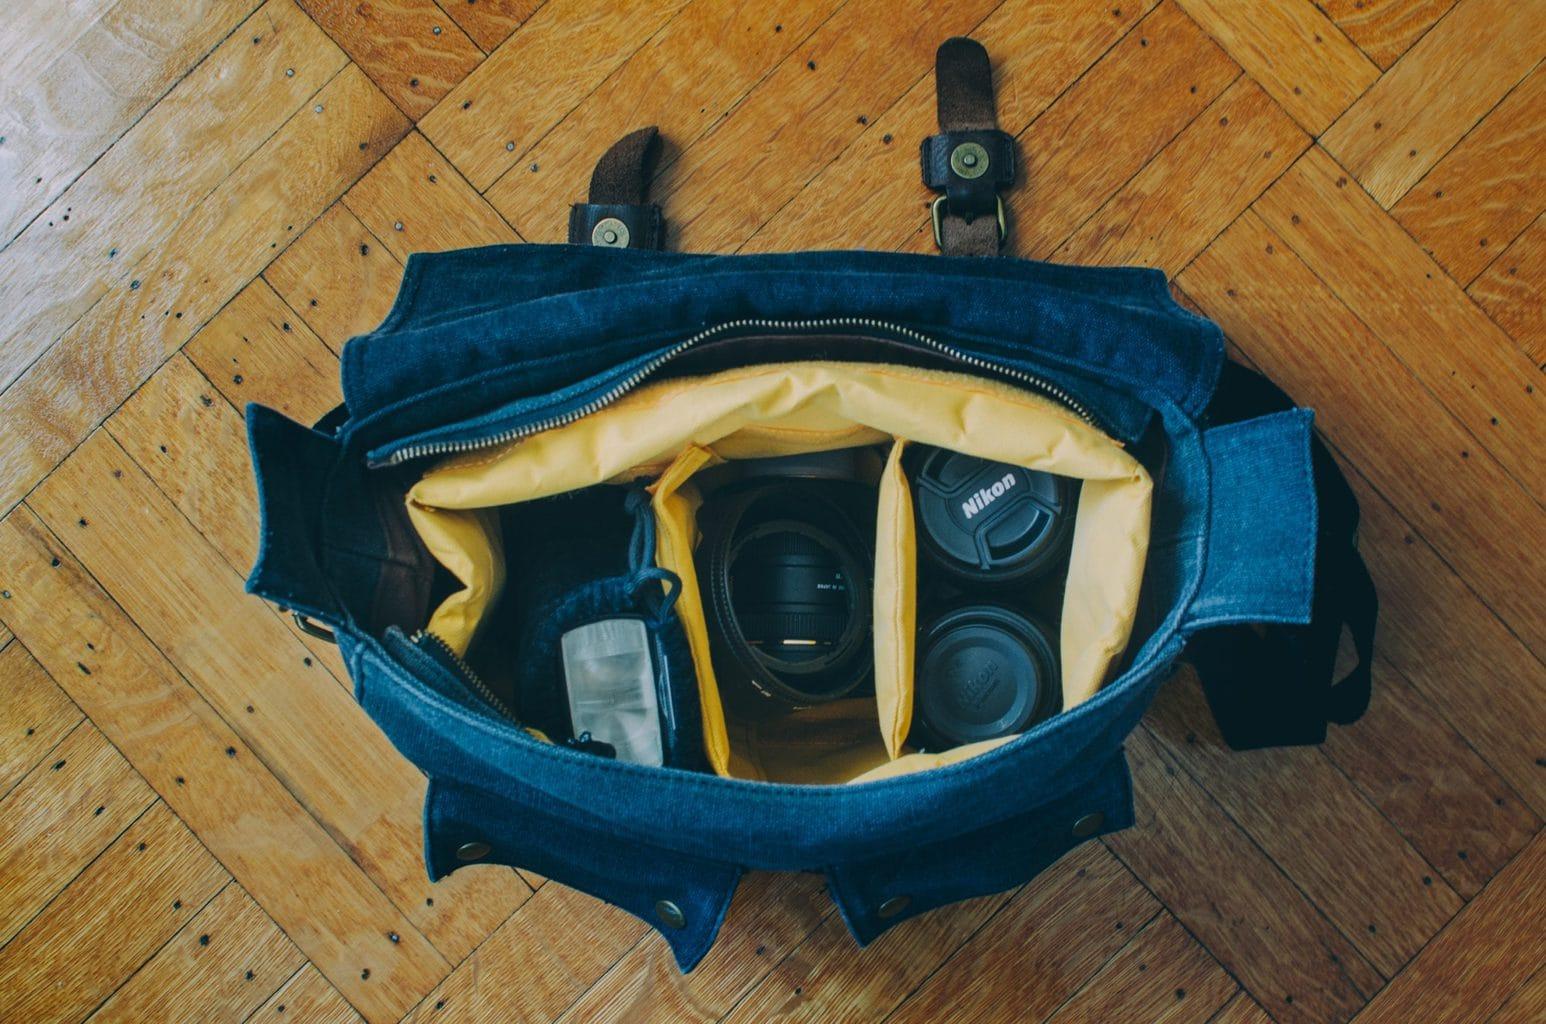 Bolsa para equipo fotográfico